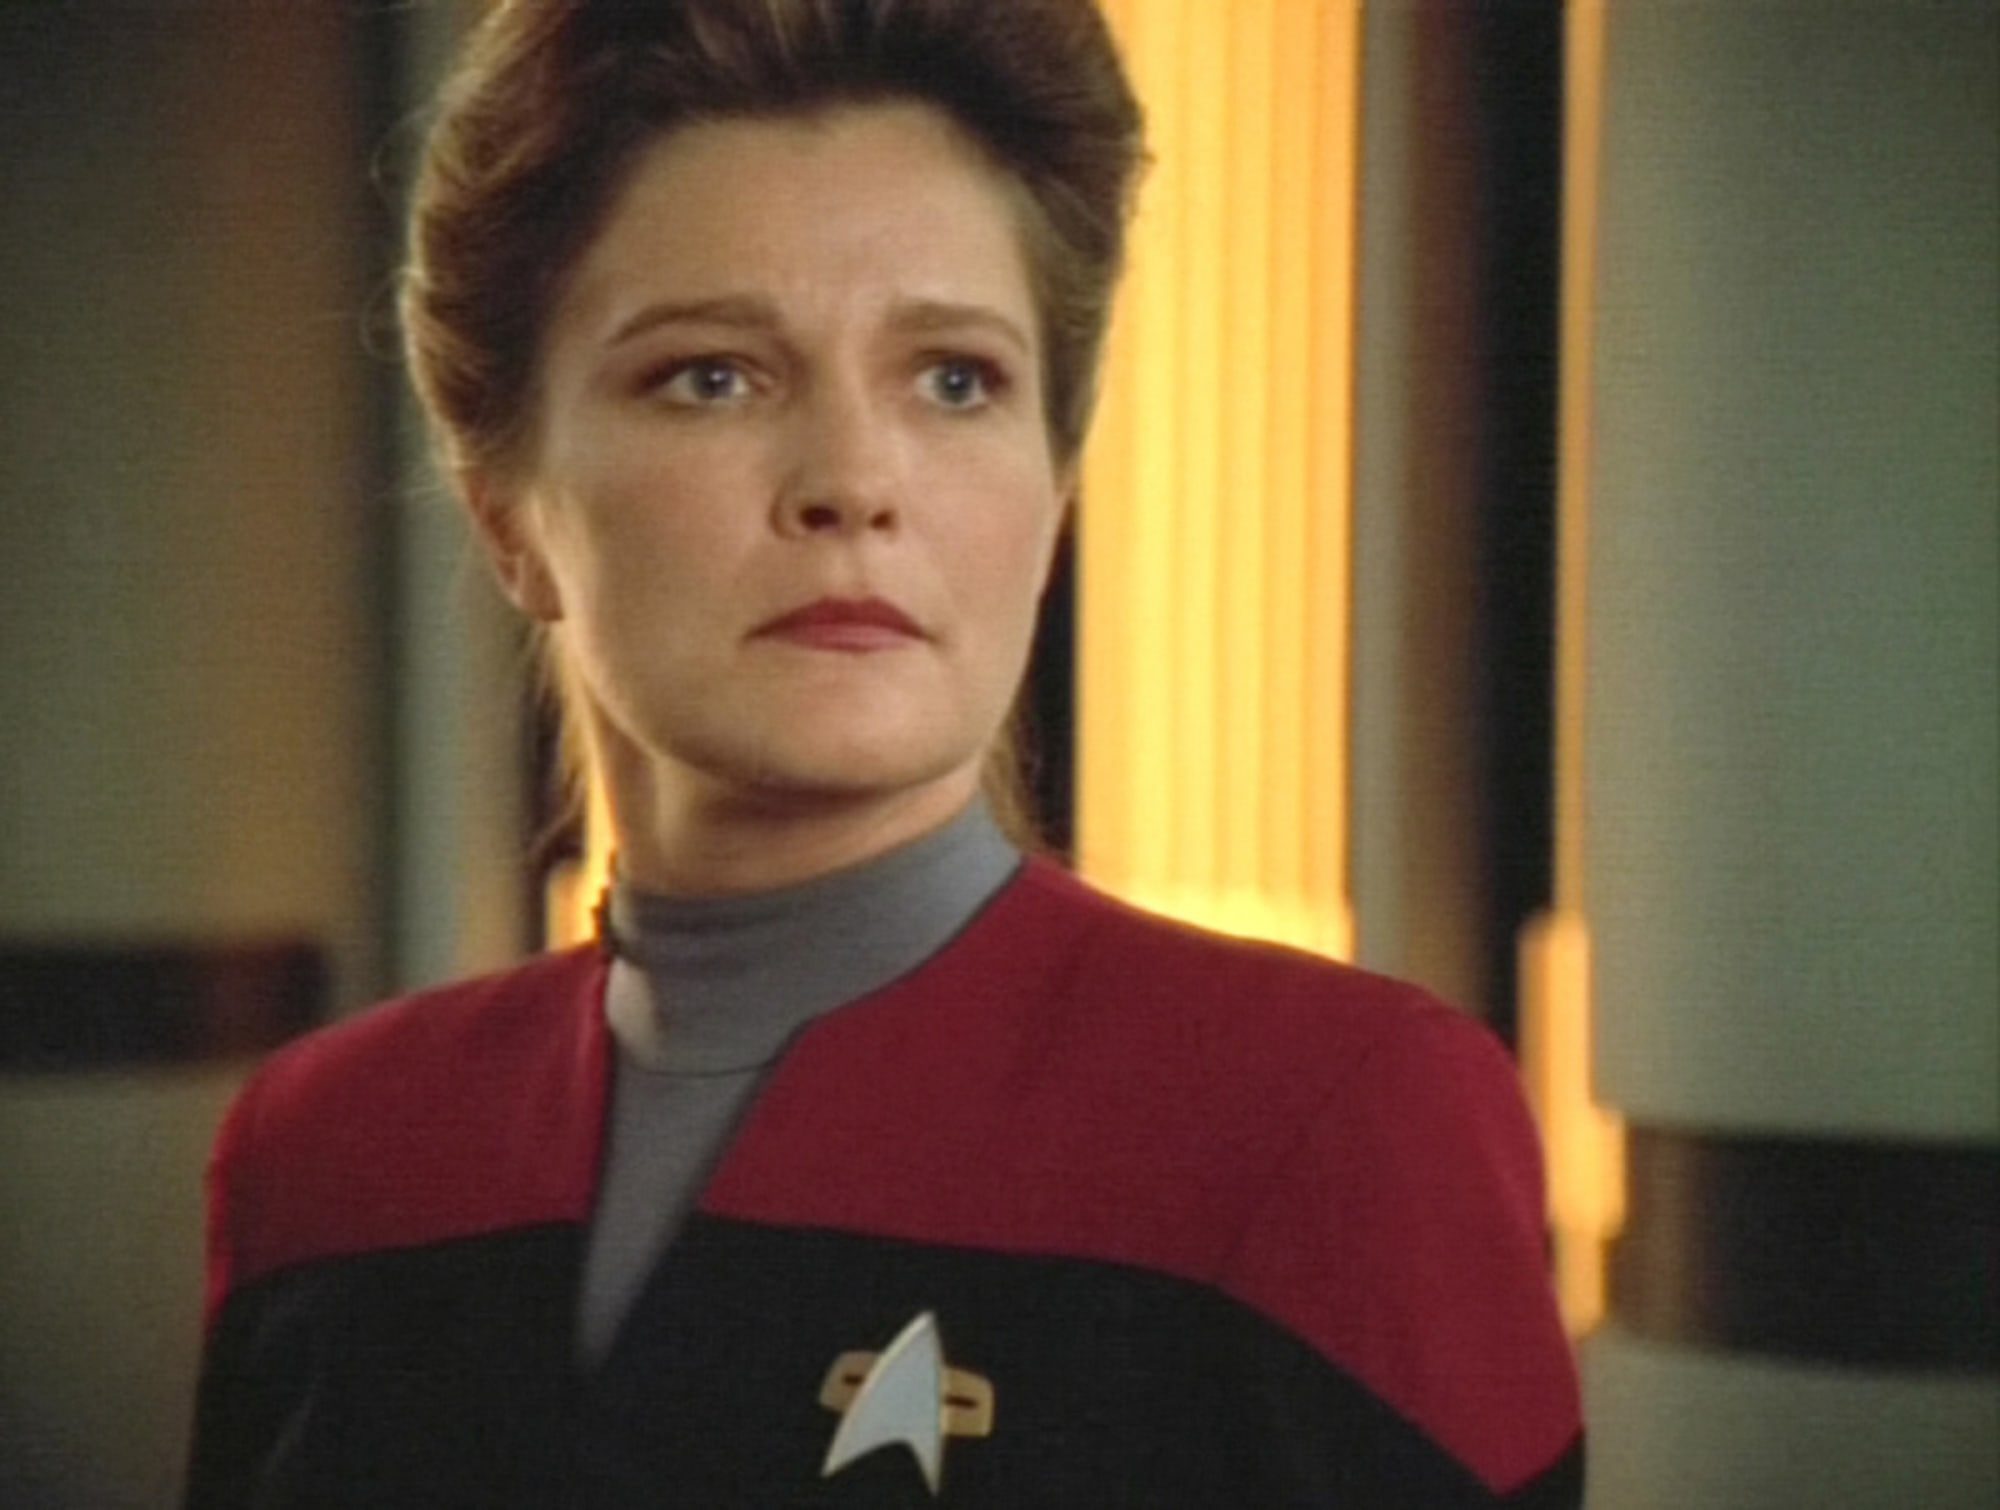 Star Trek: Voyager – Kathryn Janeway handled Tuvix correctly